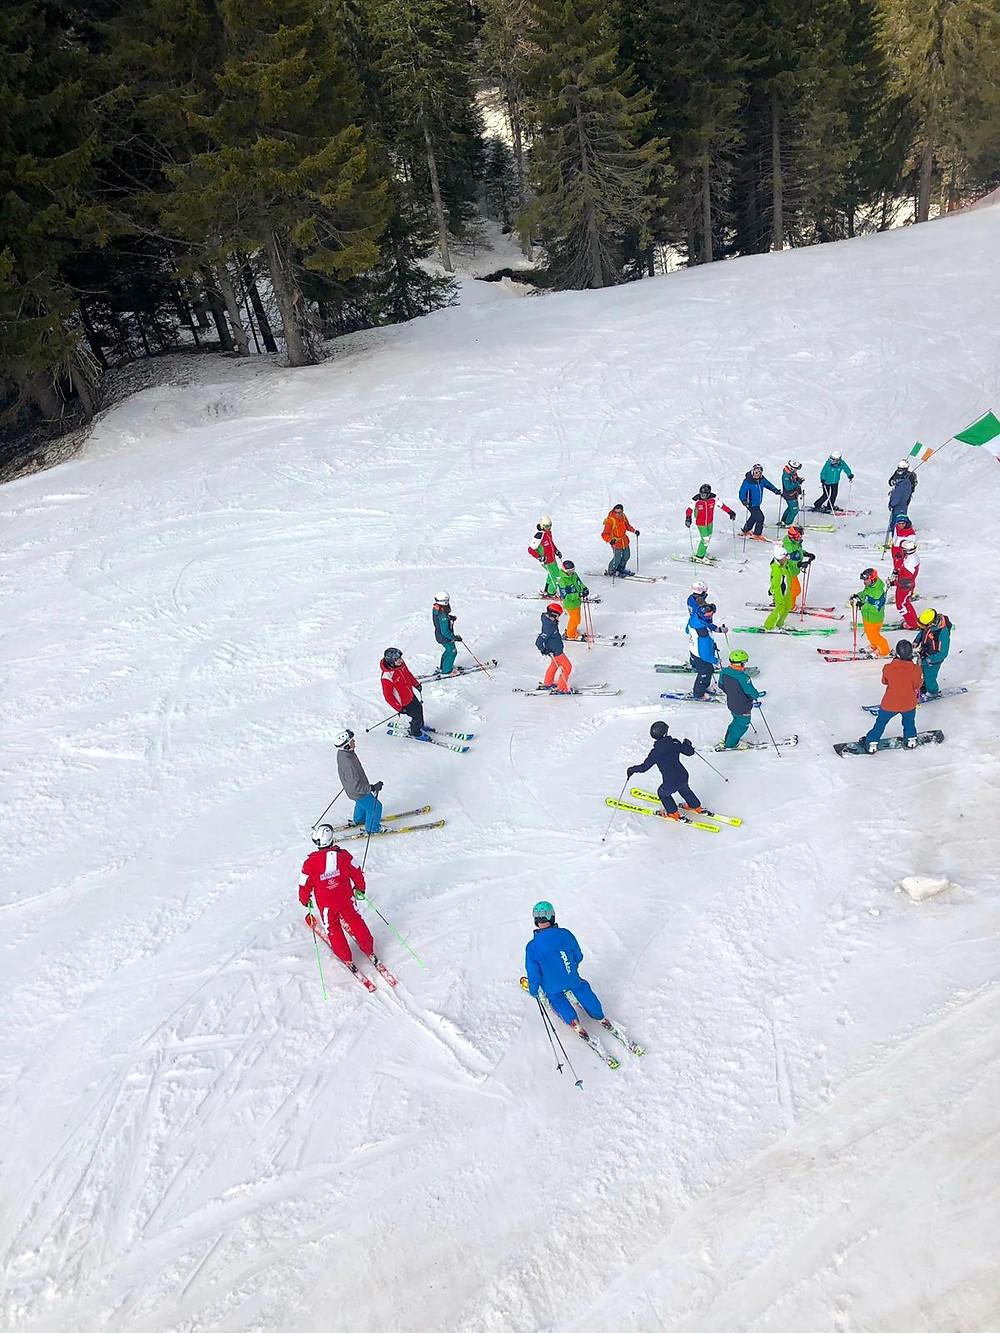 Ireland at Interski 2019 delivering their on-snow workshops